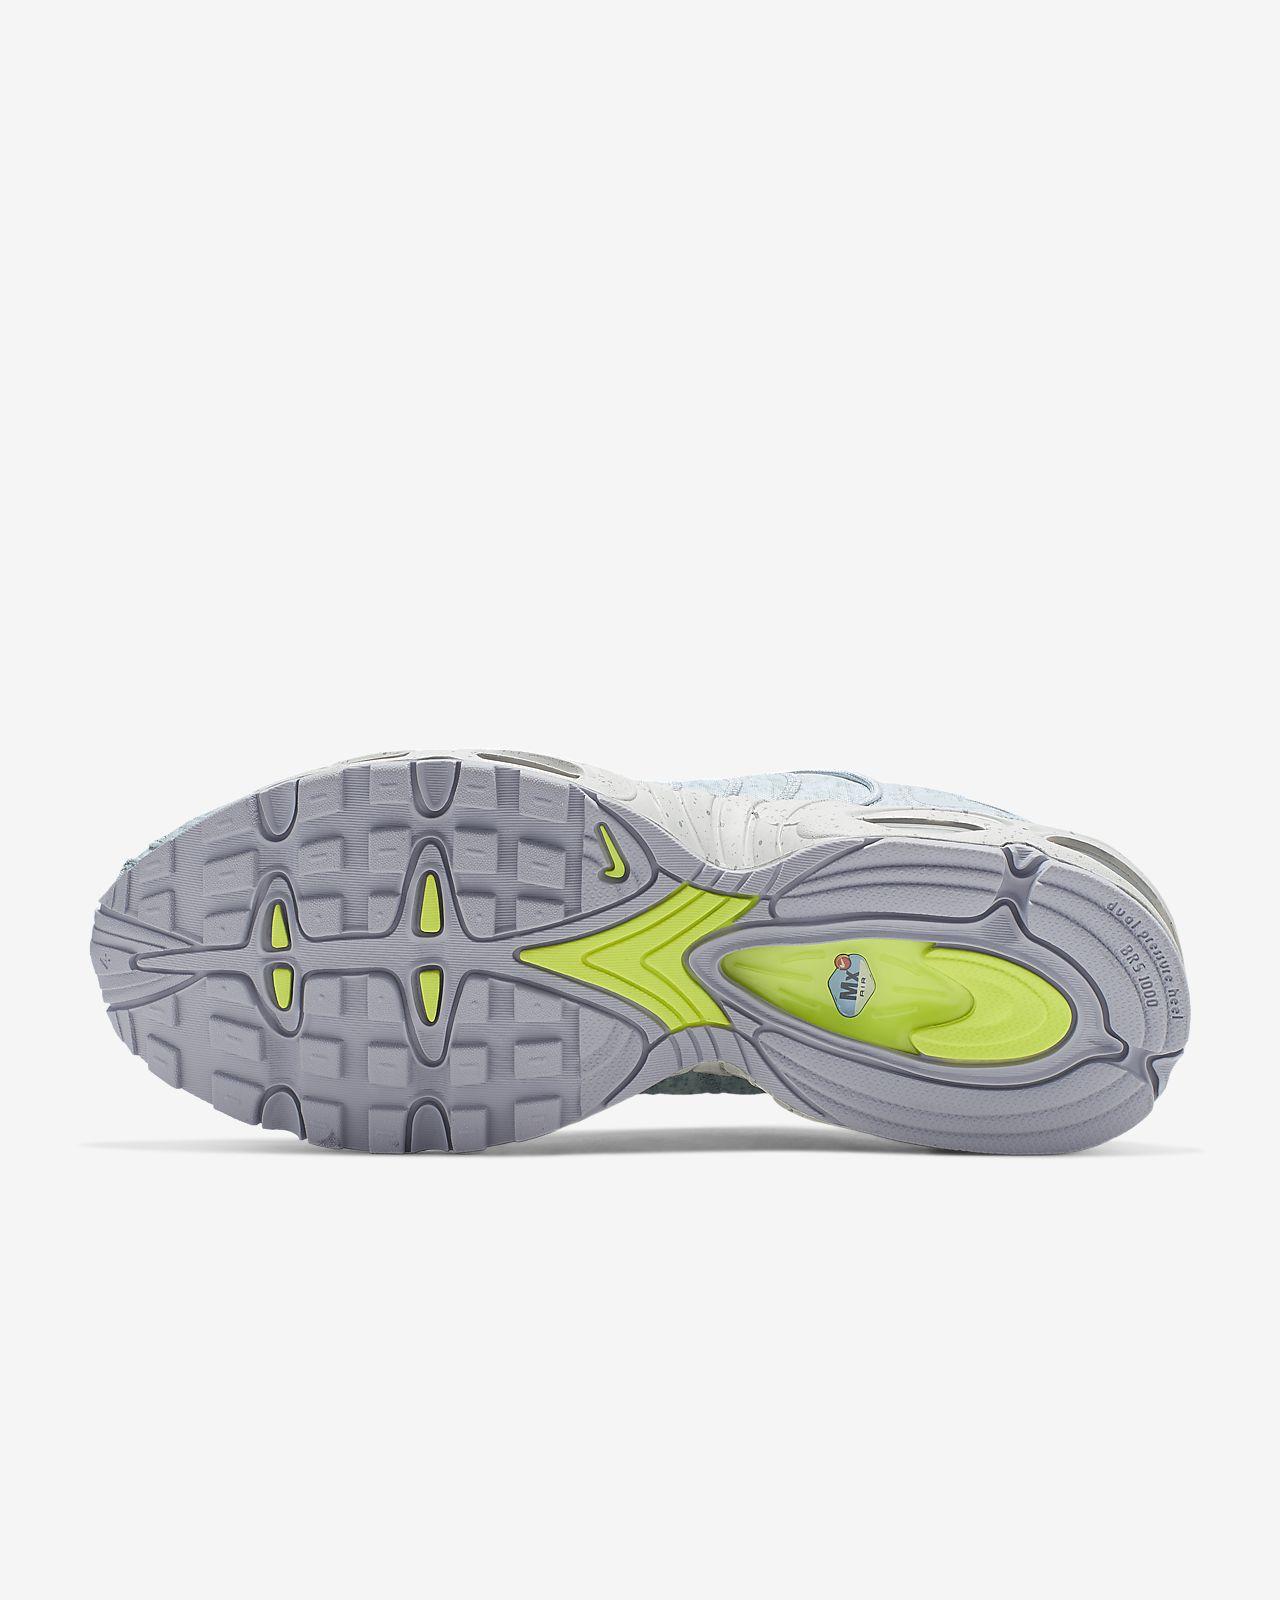 Nike Air Griffey Max 1 Homme Cross Entraînement Chaussures 354912 105